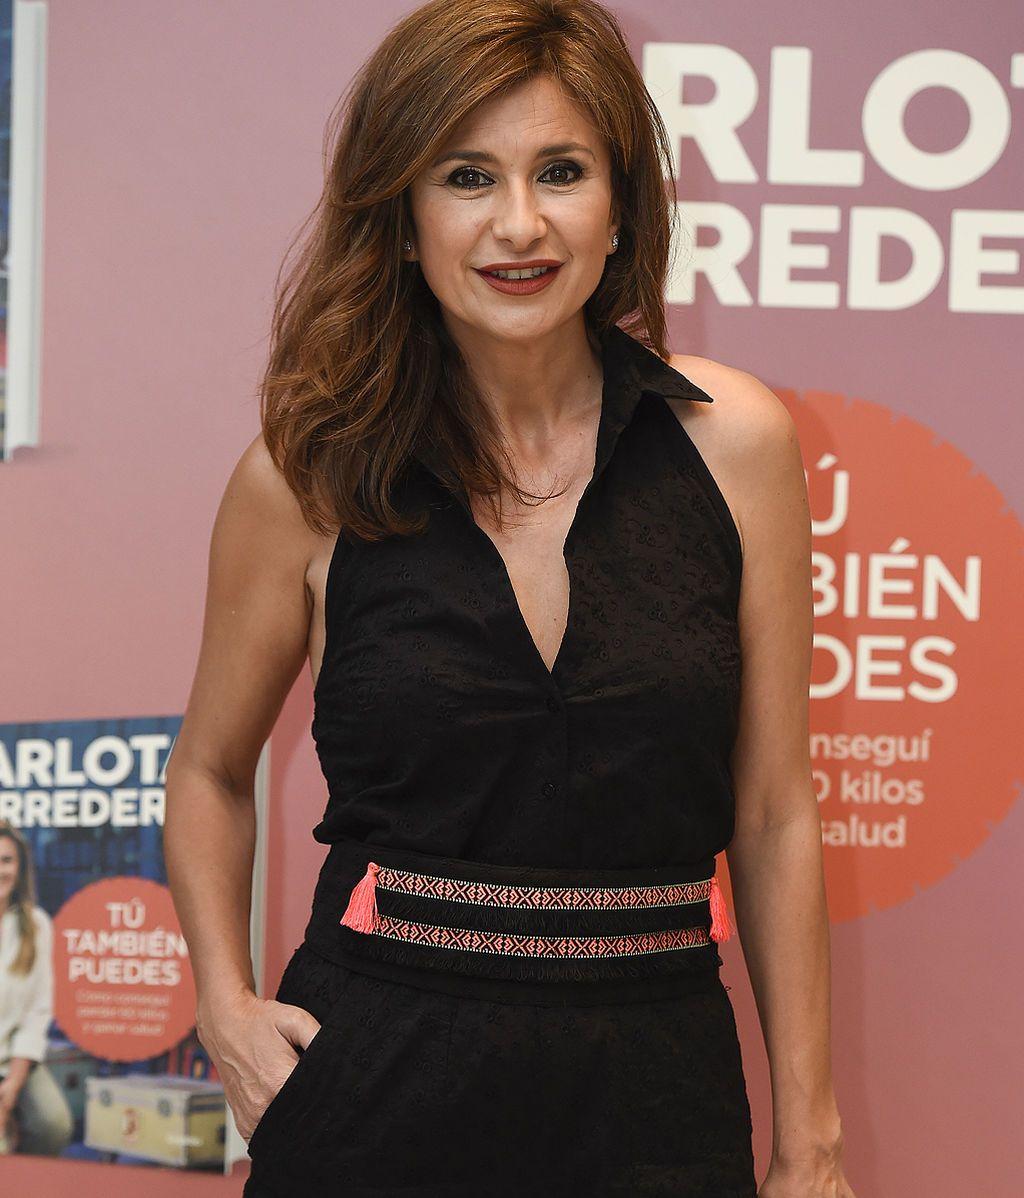 La periodista Gema López, colaboradora de 'Sálvame'